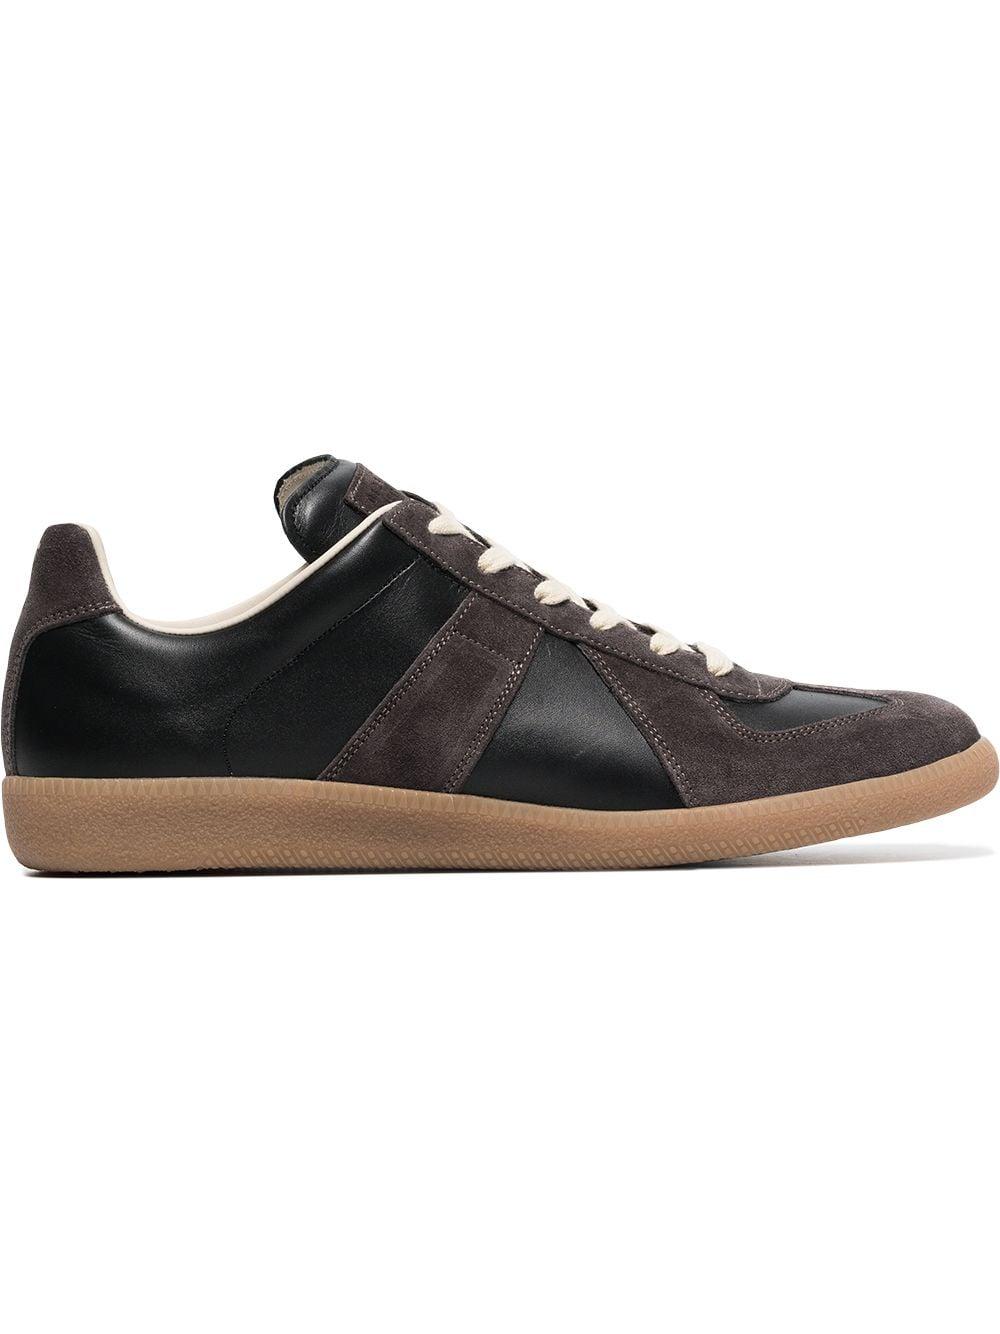 SNEAKERS REPLICA UOMO MAISON MARGIELA | Sneakers | S57WS0236 P1895900